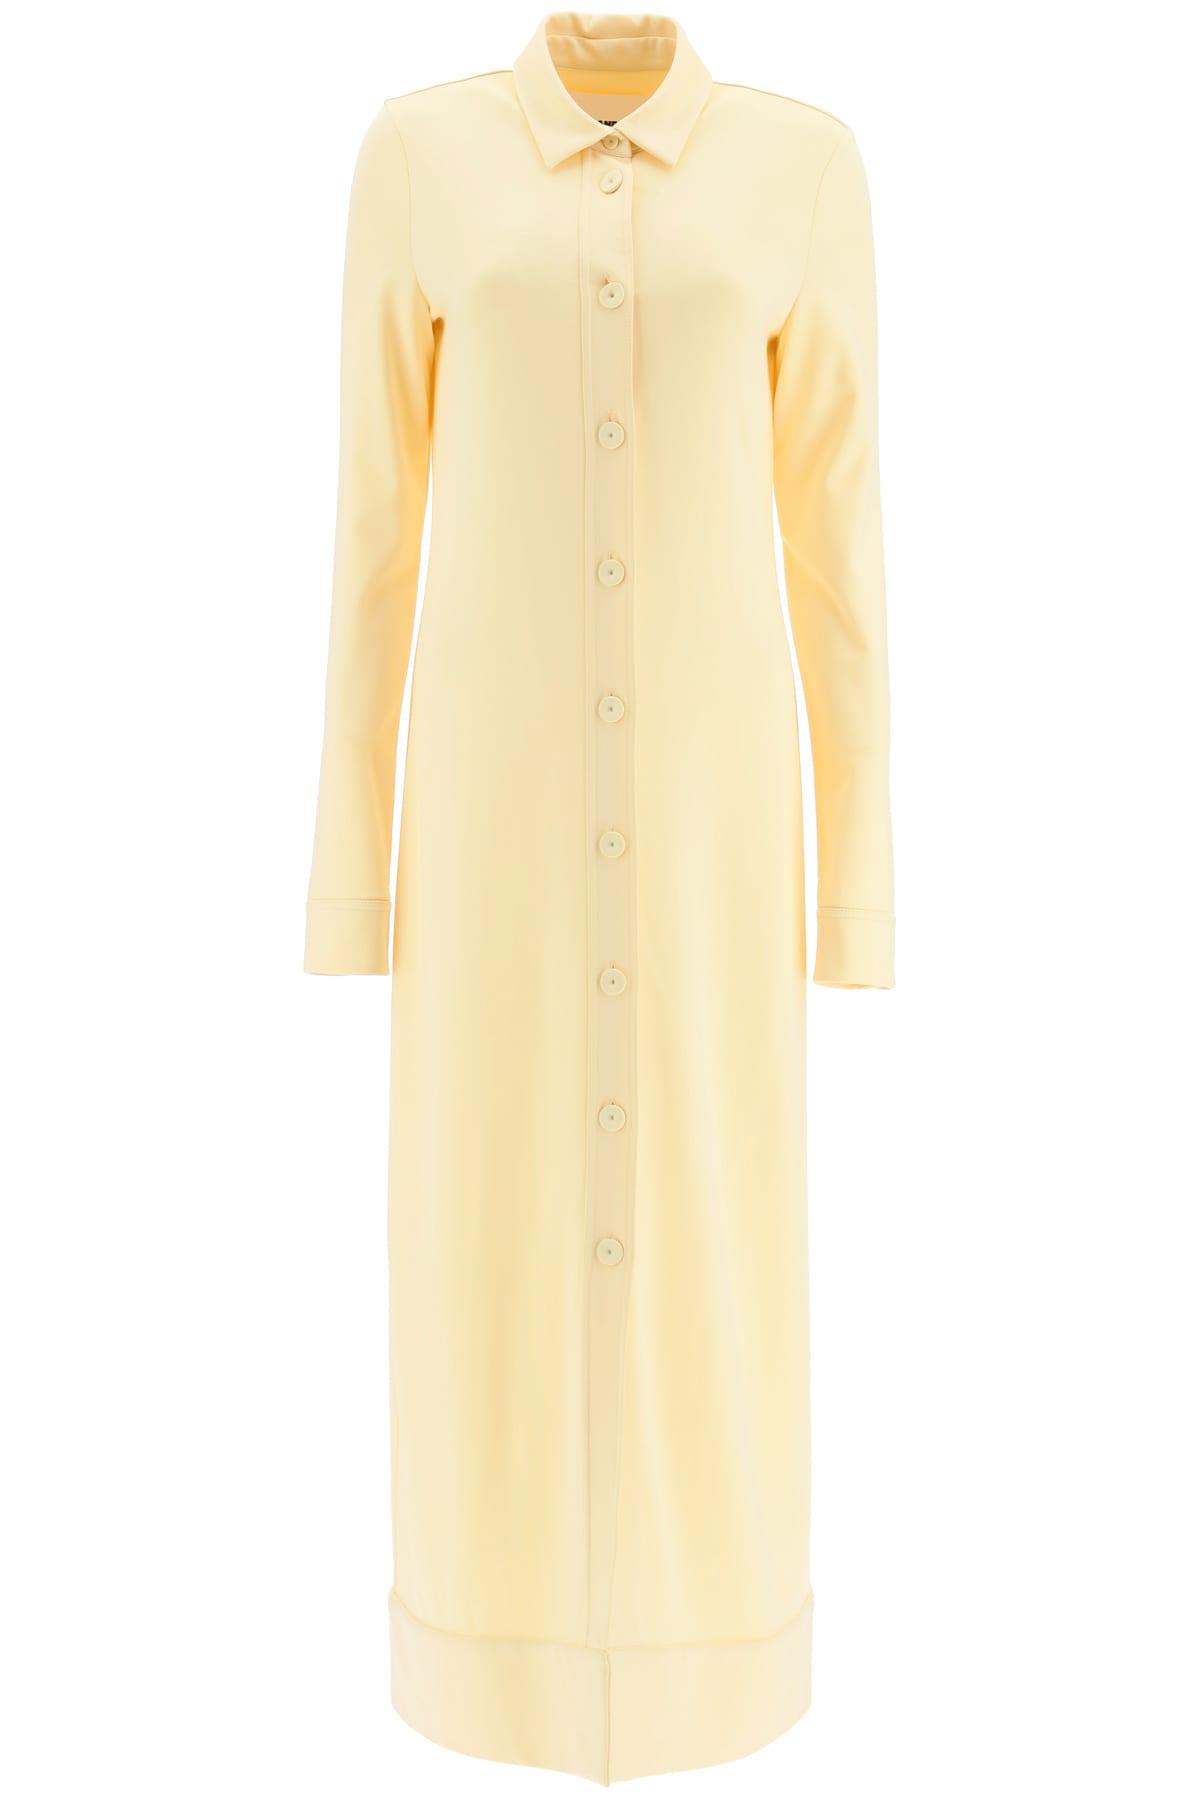 Buy Jil Sander Maxi Shirt Dress online, shop Jil Sander with free shipping